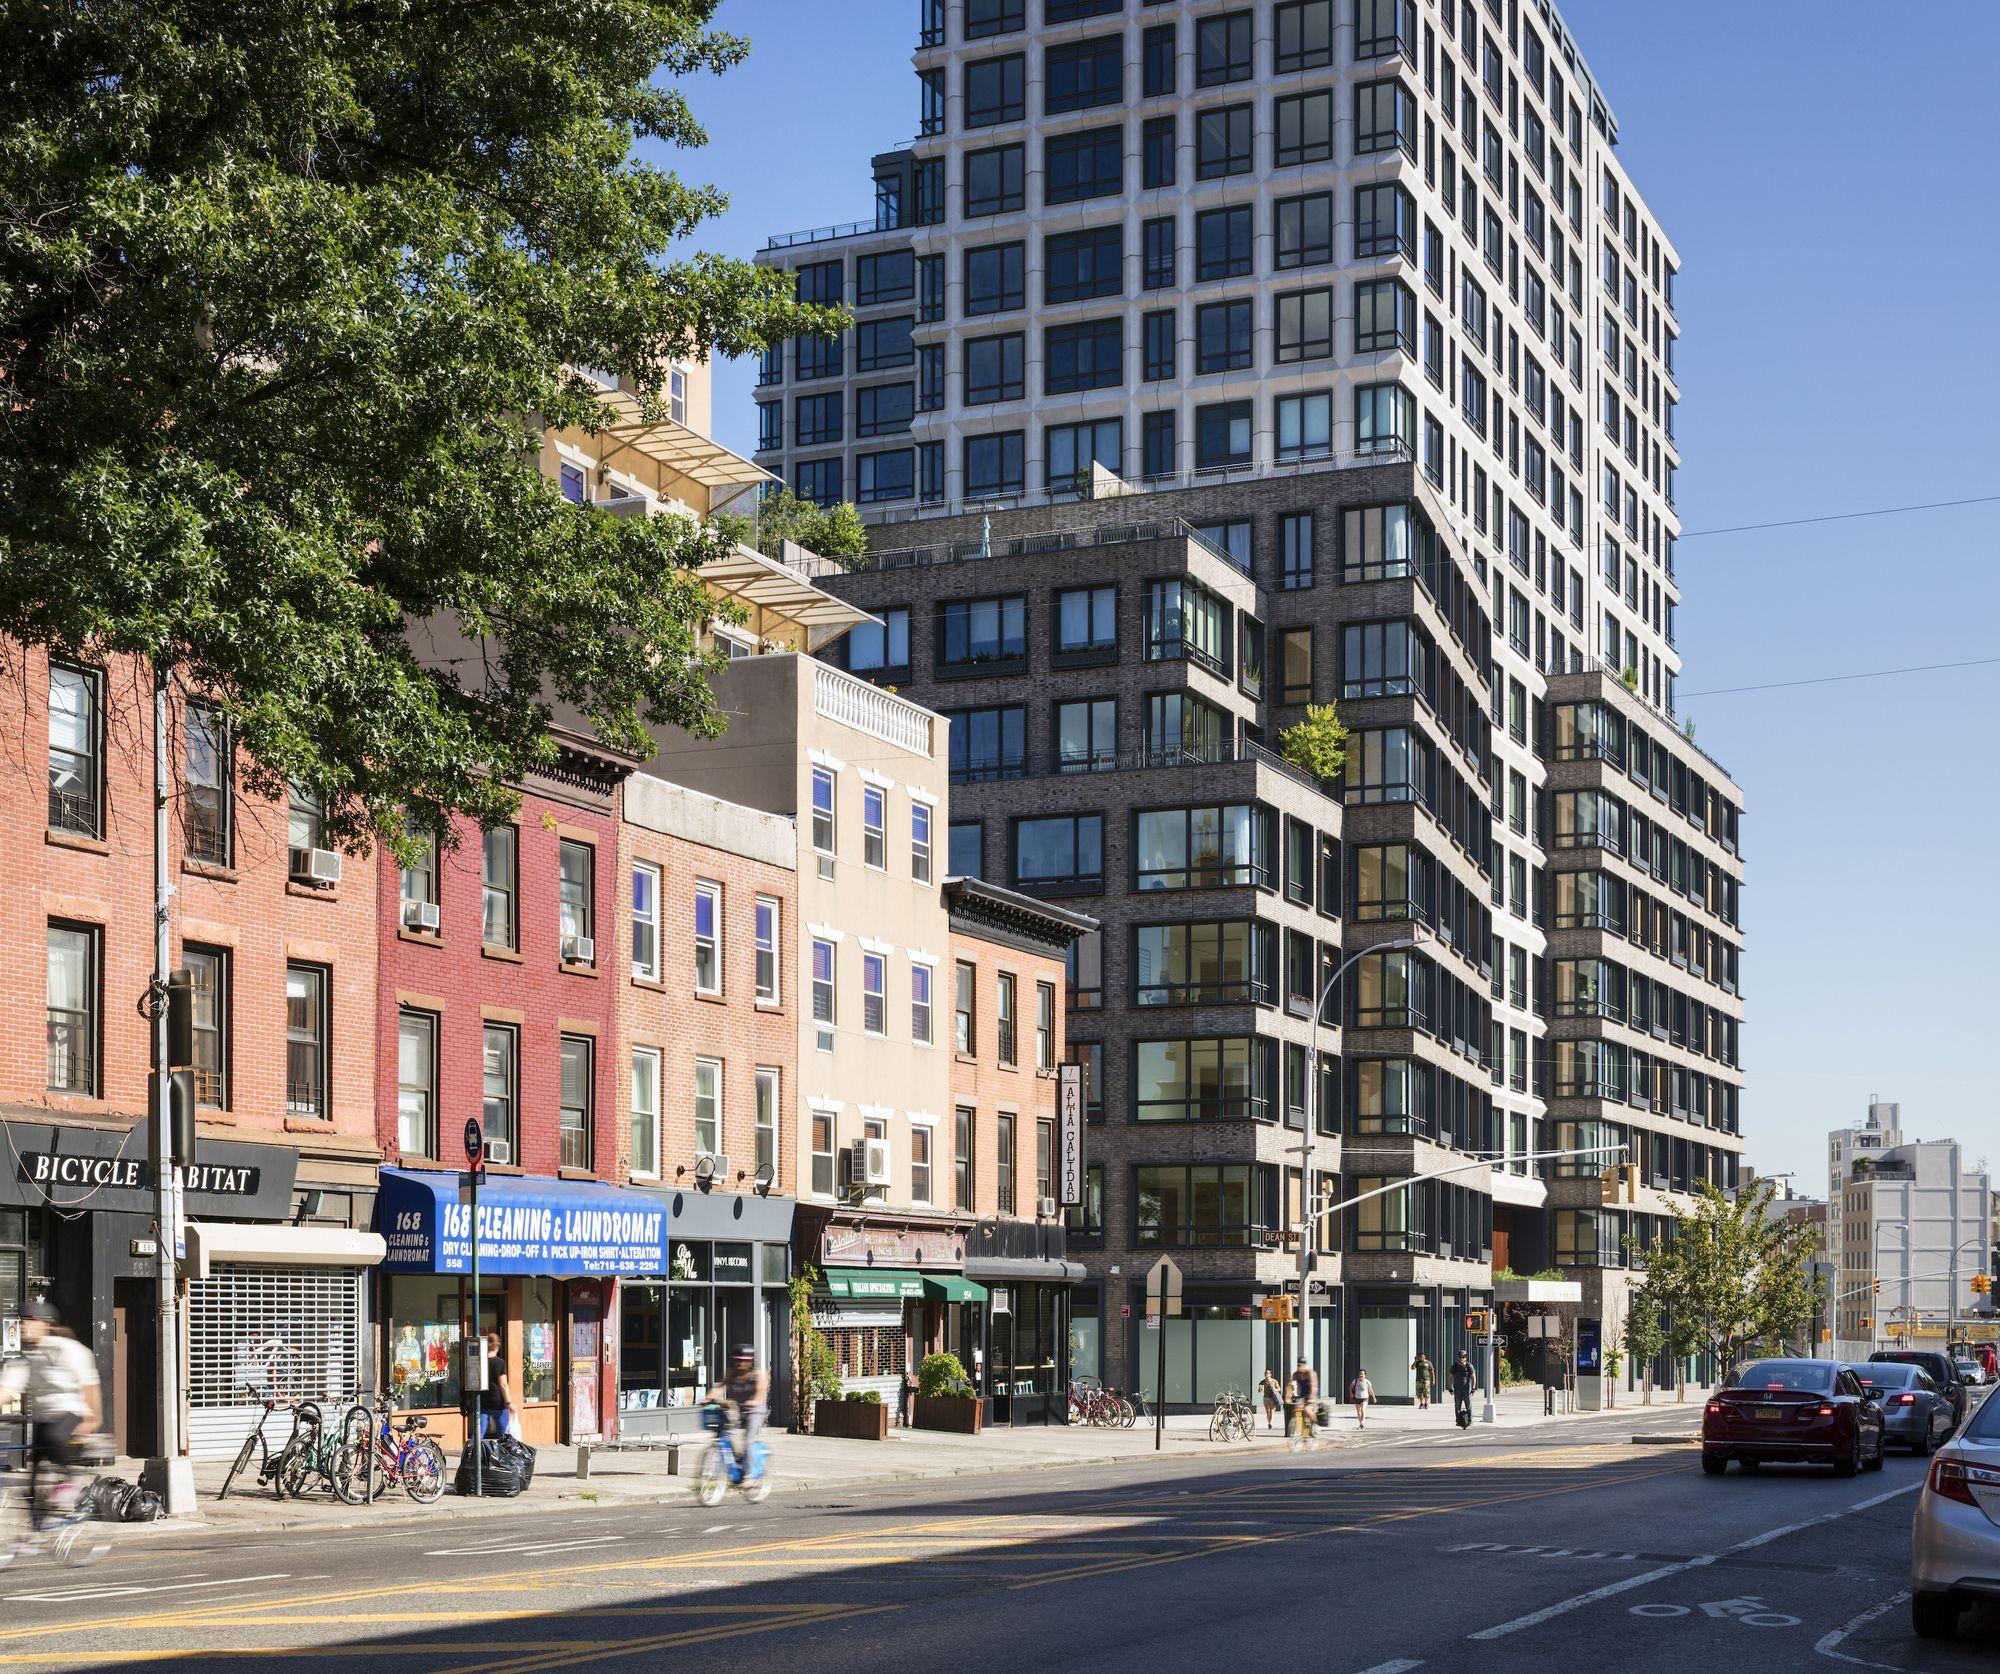 550 Vanderbilt Apartments / COOKFOX Architects